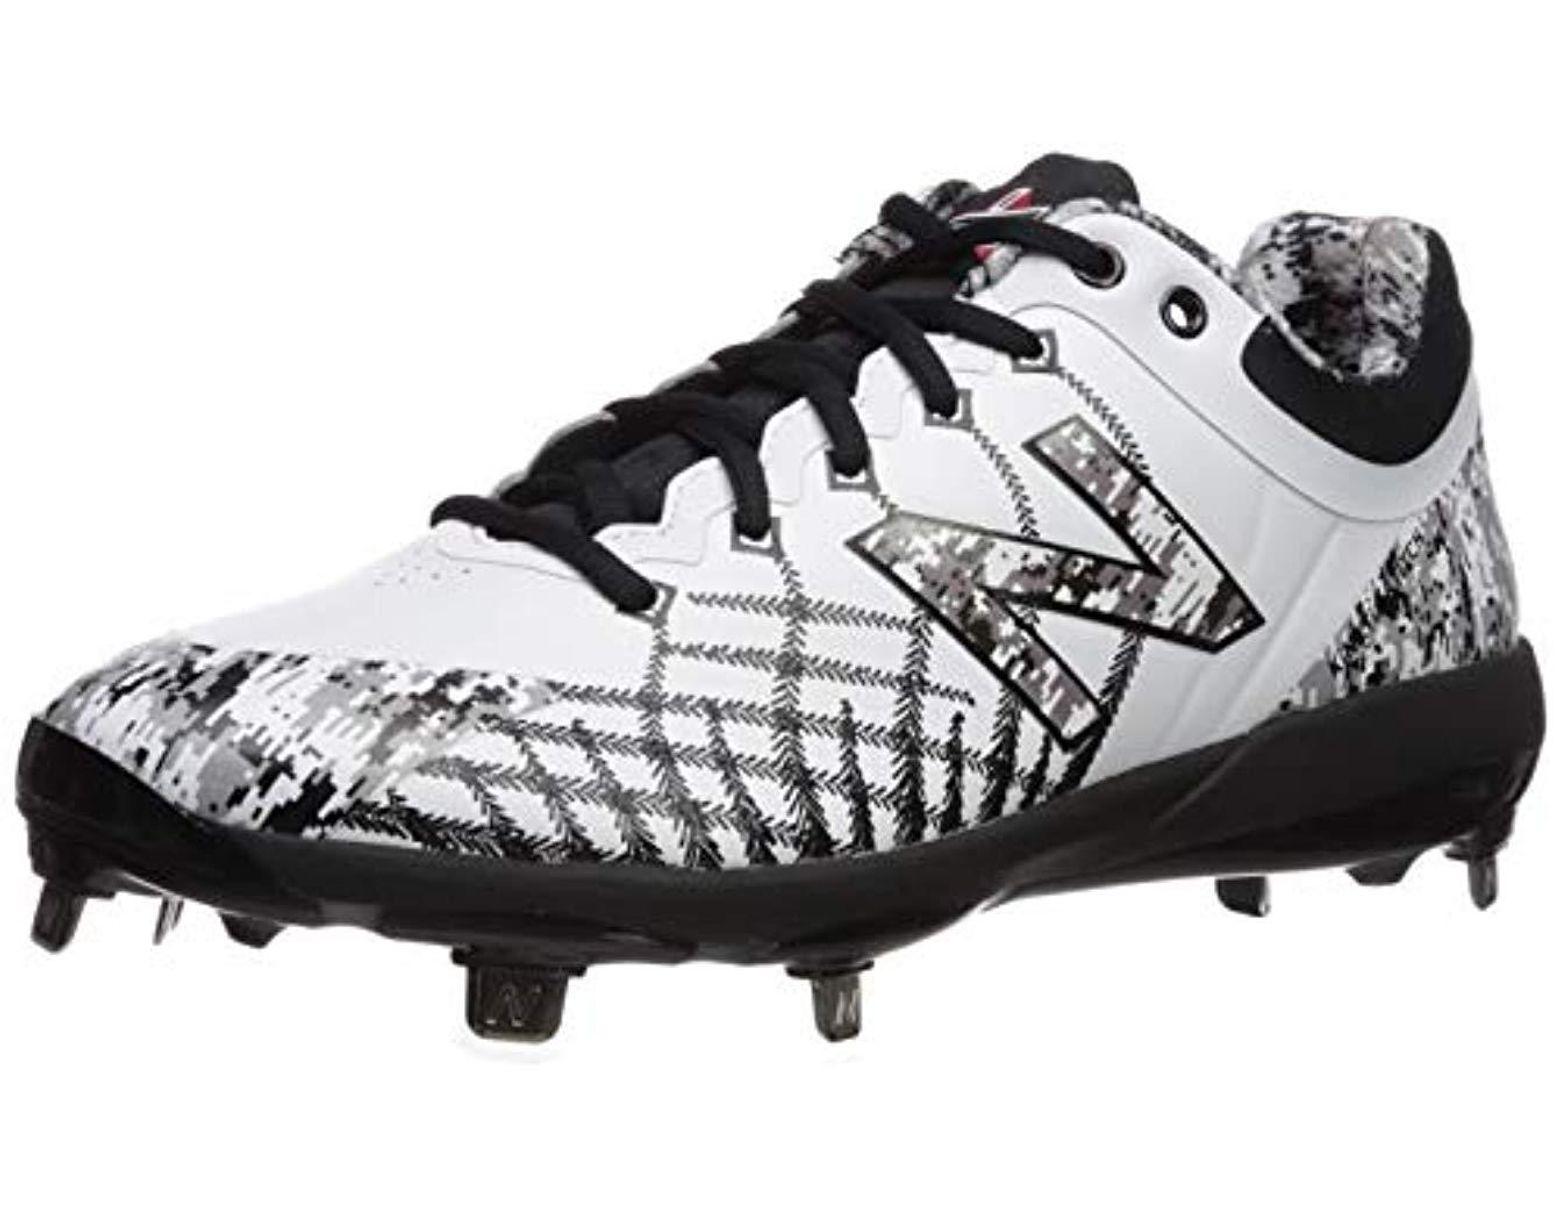 596d4baf29 New Balance - 4040v5 Metal Baseball Shoe, Pedroia White/camo, 7.5 Xw Us for  Men - Lyst